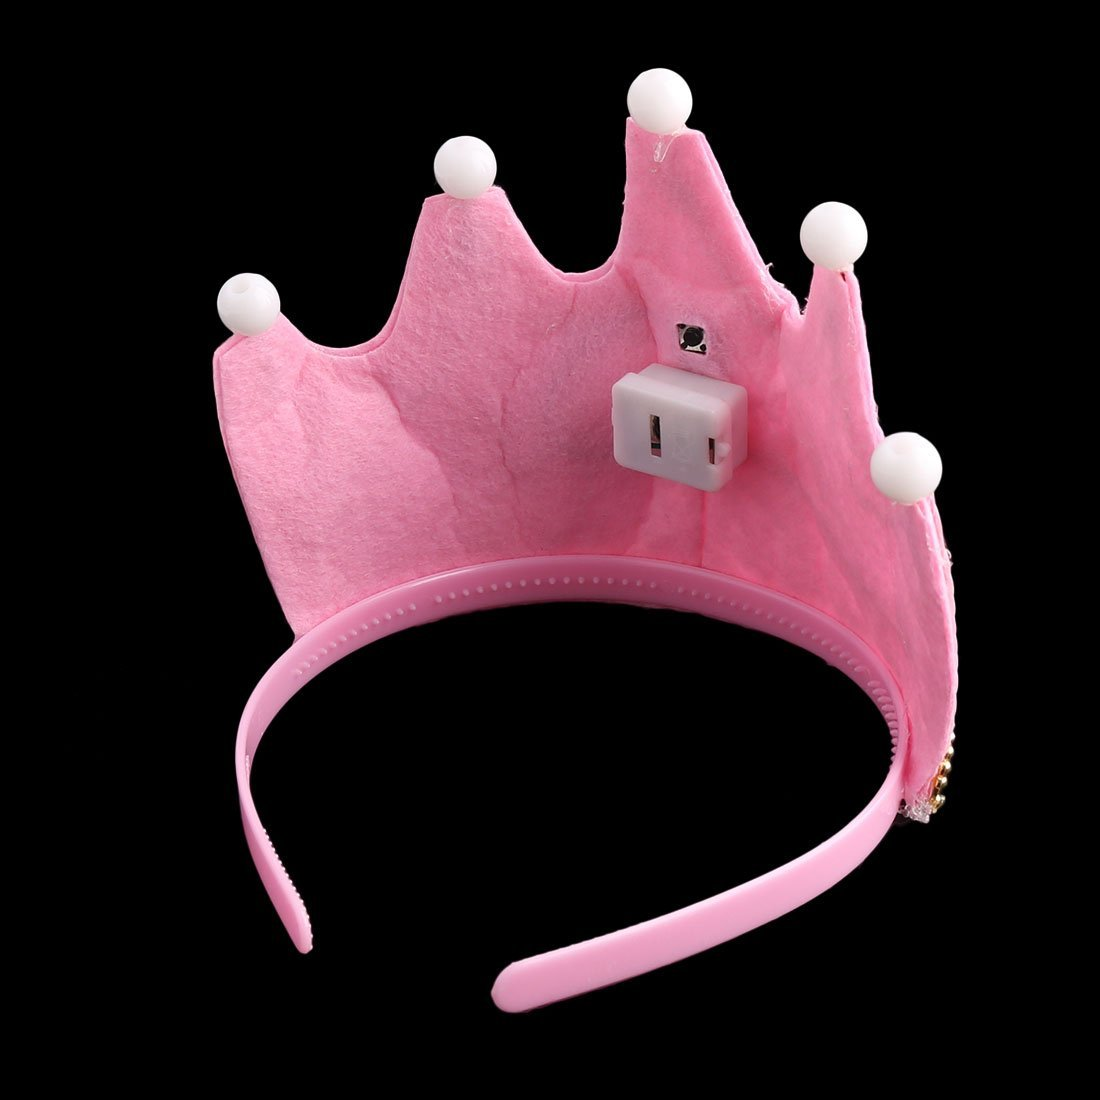 Amazon.com: eDealMax La Fiesta de cumpleaños Eventos Forma de Corona Princesa Carta de Bolas casquillo de la luz LED 2 PCS rosa: Home & Kitchen